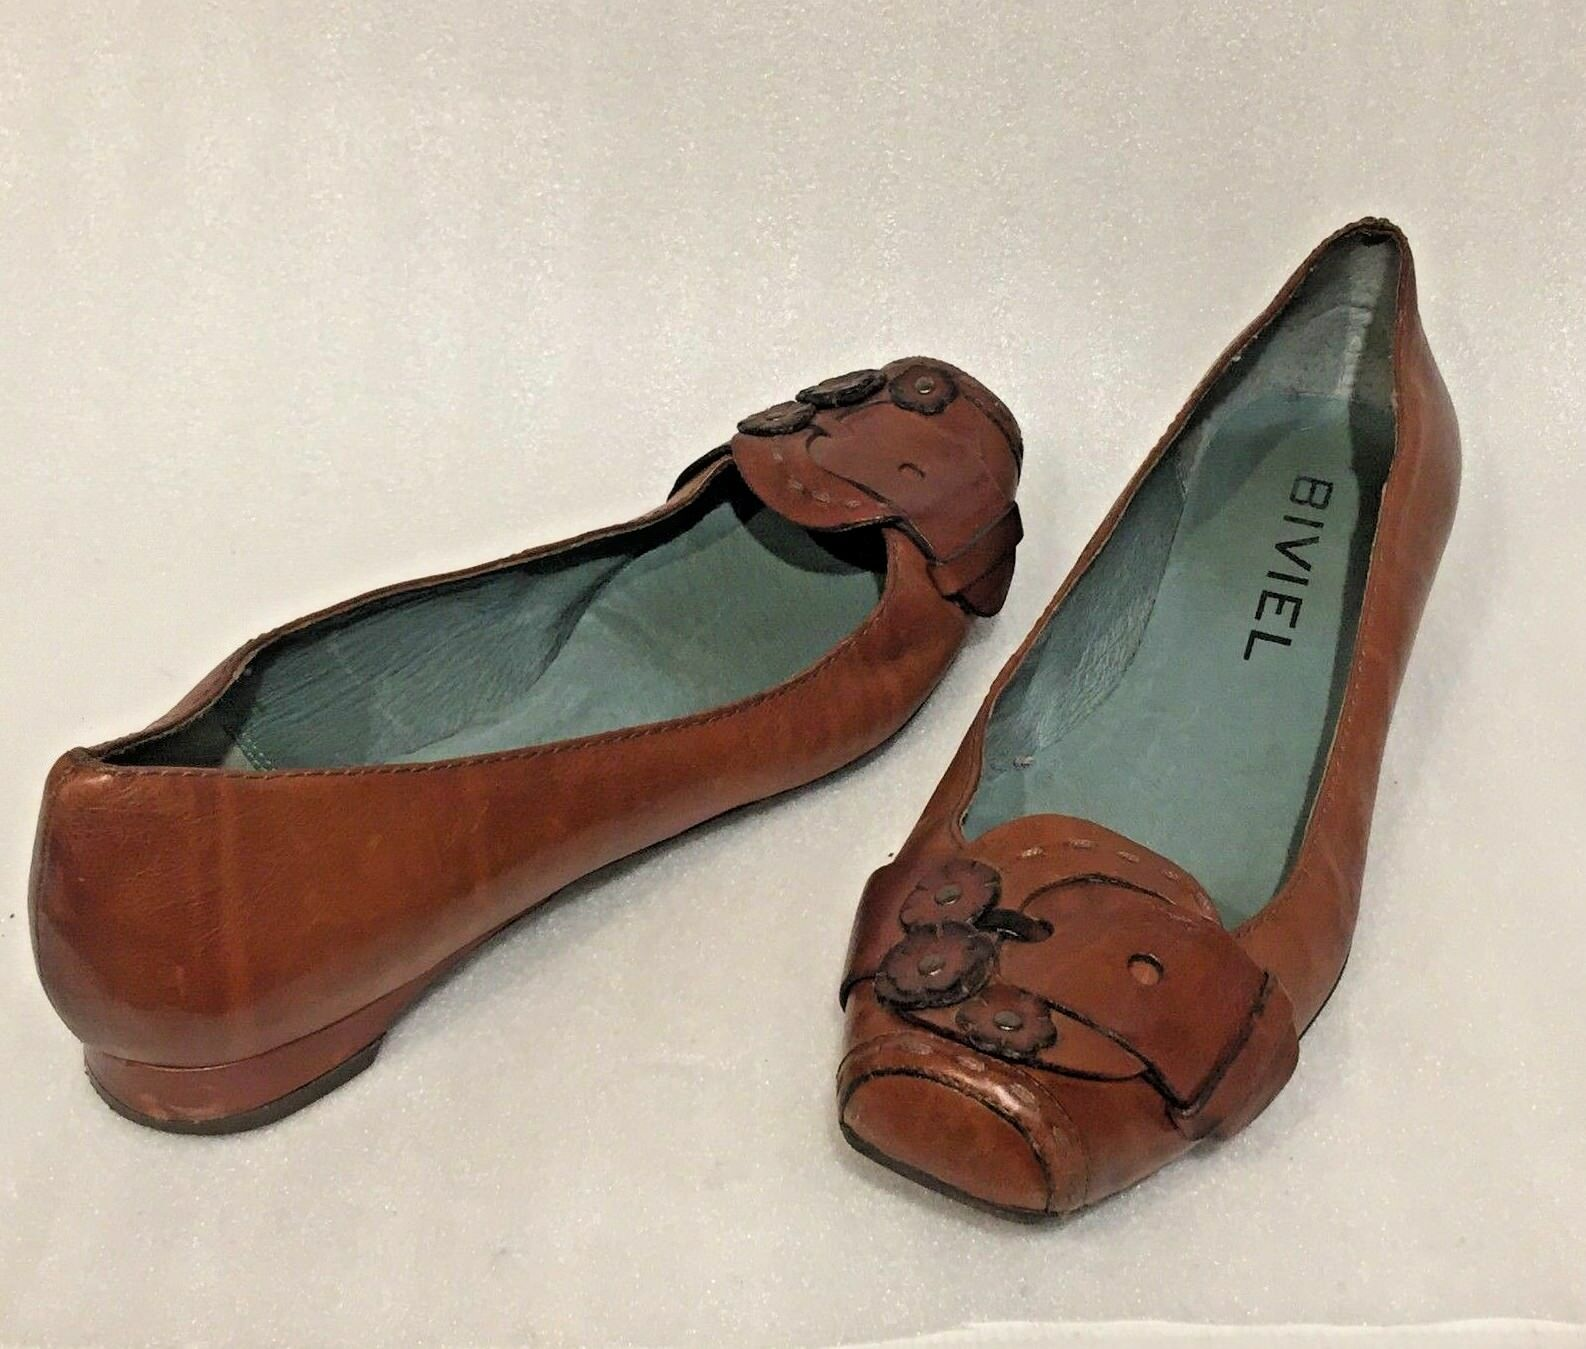 Women's BIVIEL BROWN Leather Flats Buckle Flower Trim  Size 40 EU   9 US